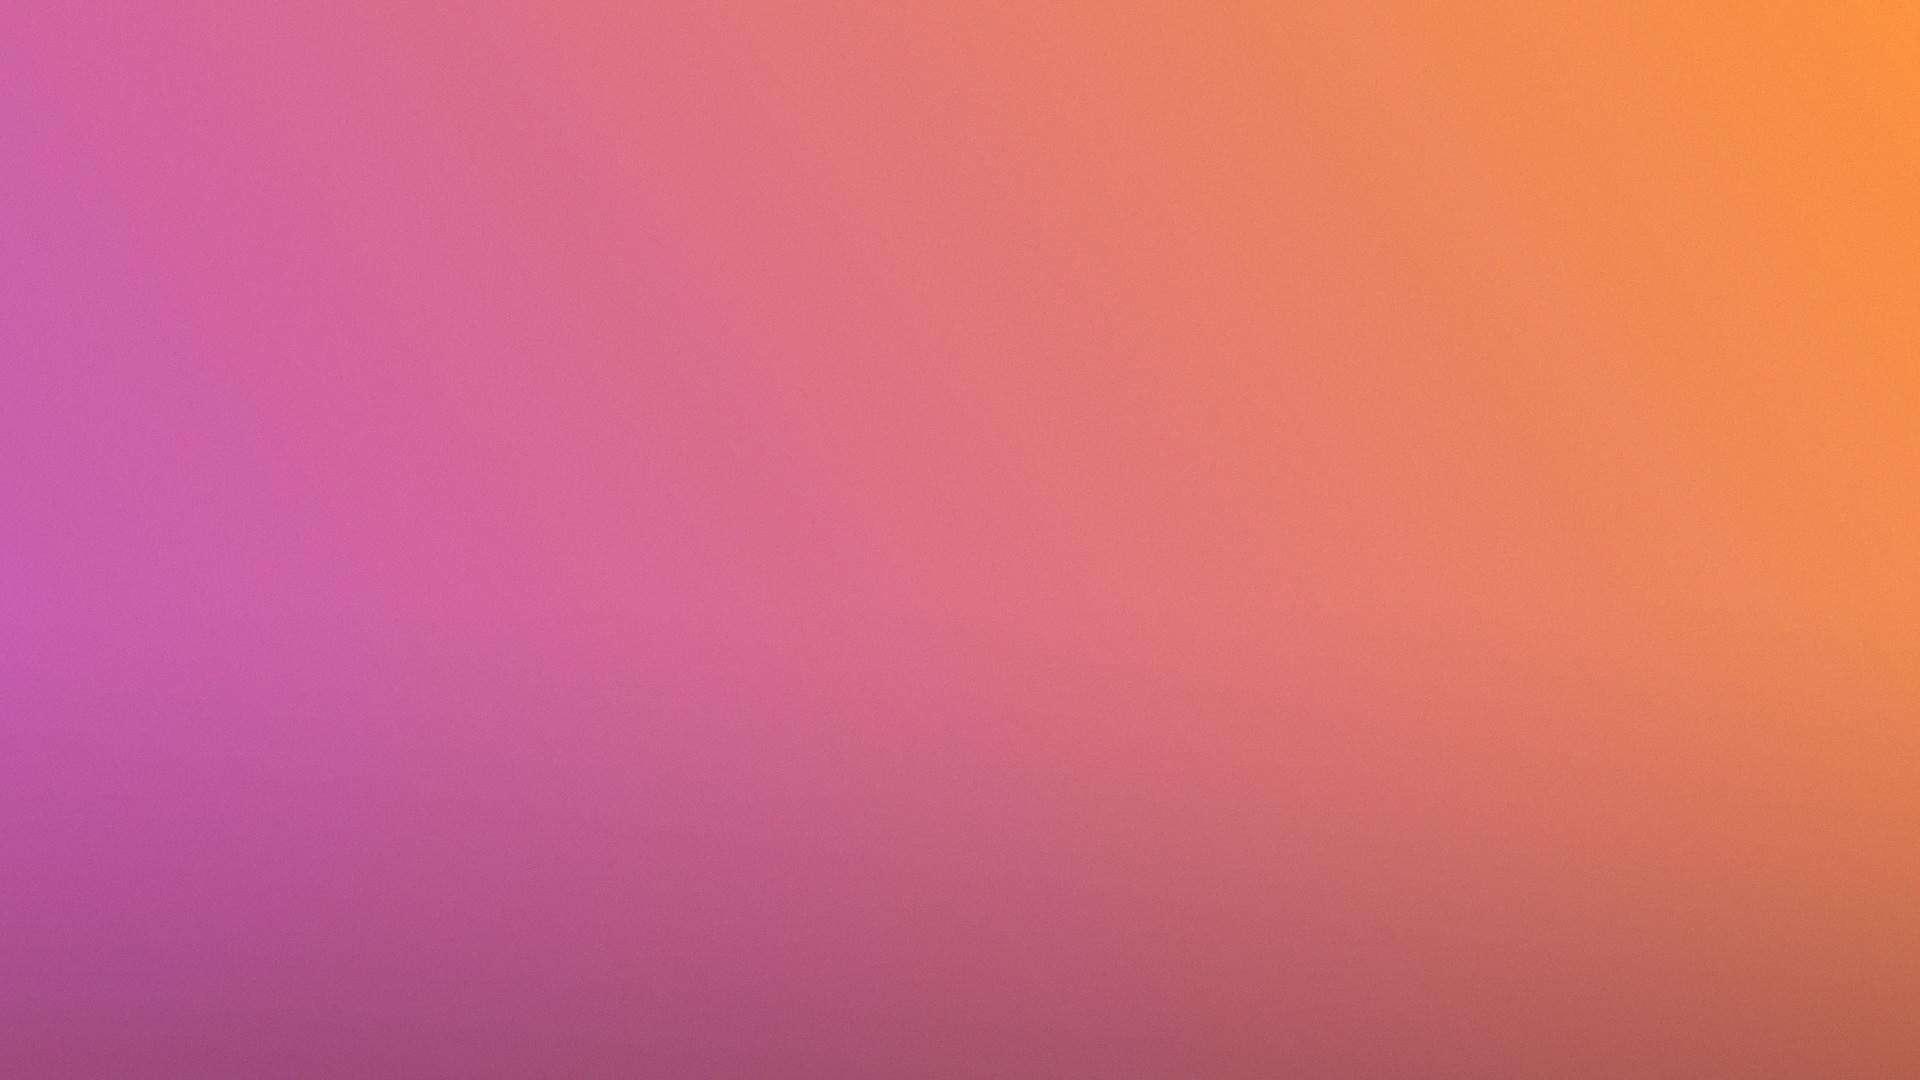 wallpaper 1920x1080 px gradient minimalism orange pink